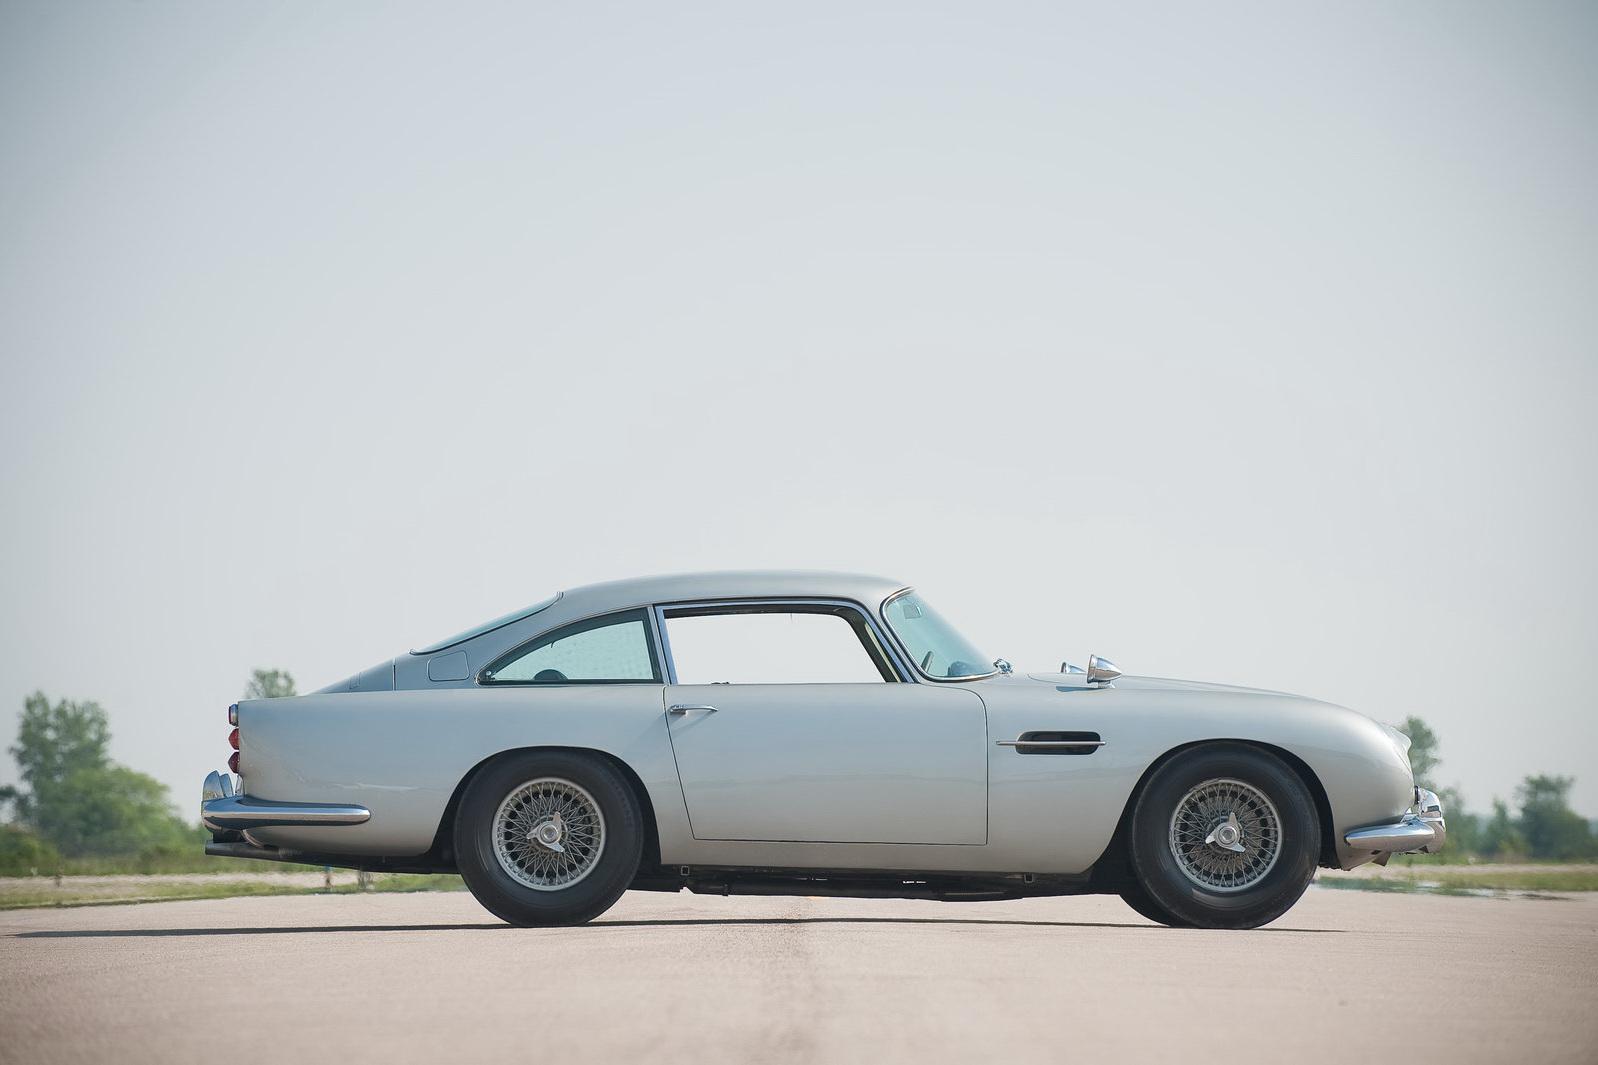 james bond 1964 aston martin db5 96 james bonds original 007 aston. Cars Review. Best American Auto & Cars Review